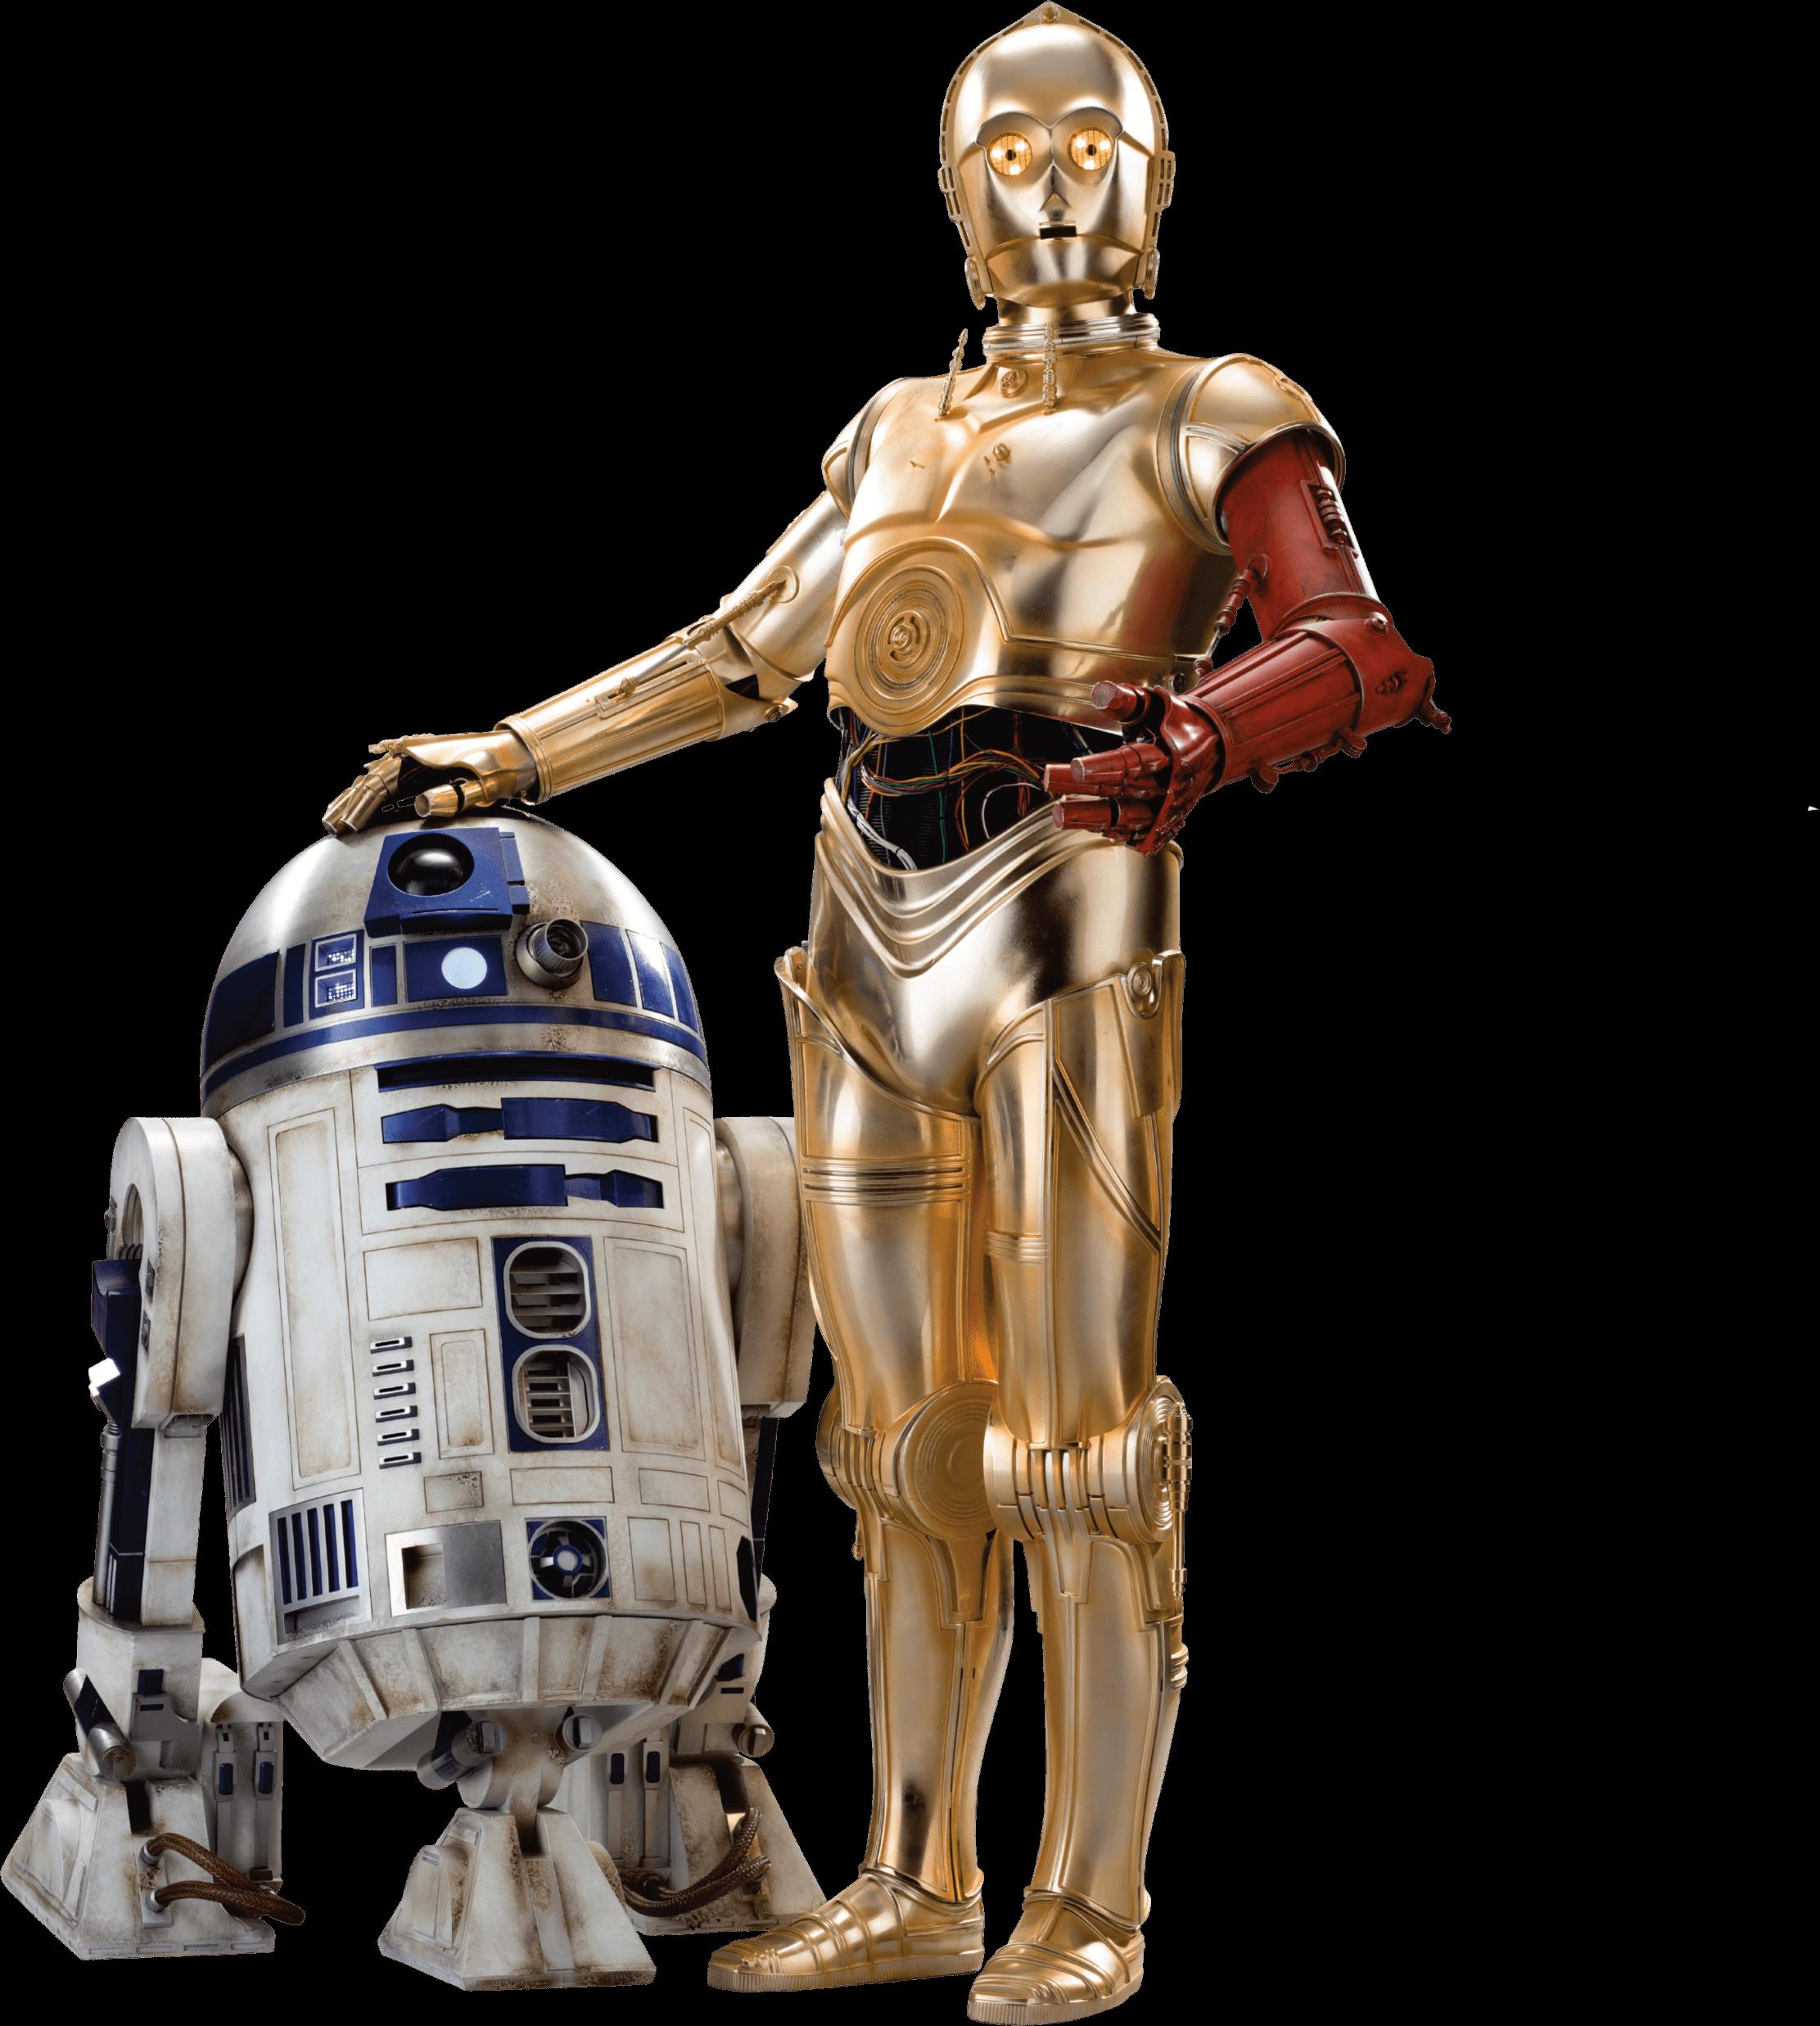 PNG Star Wars - 59893